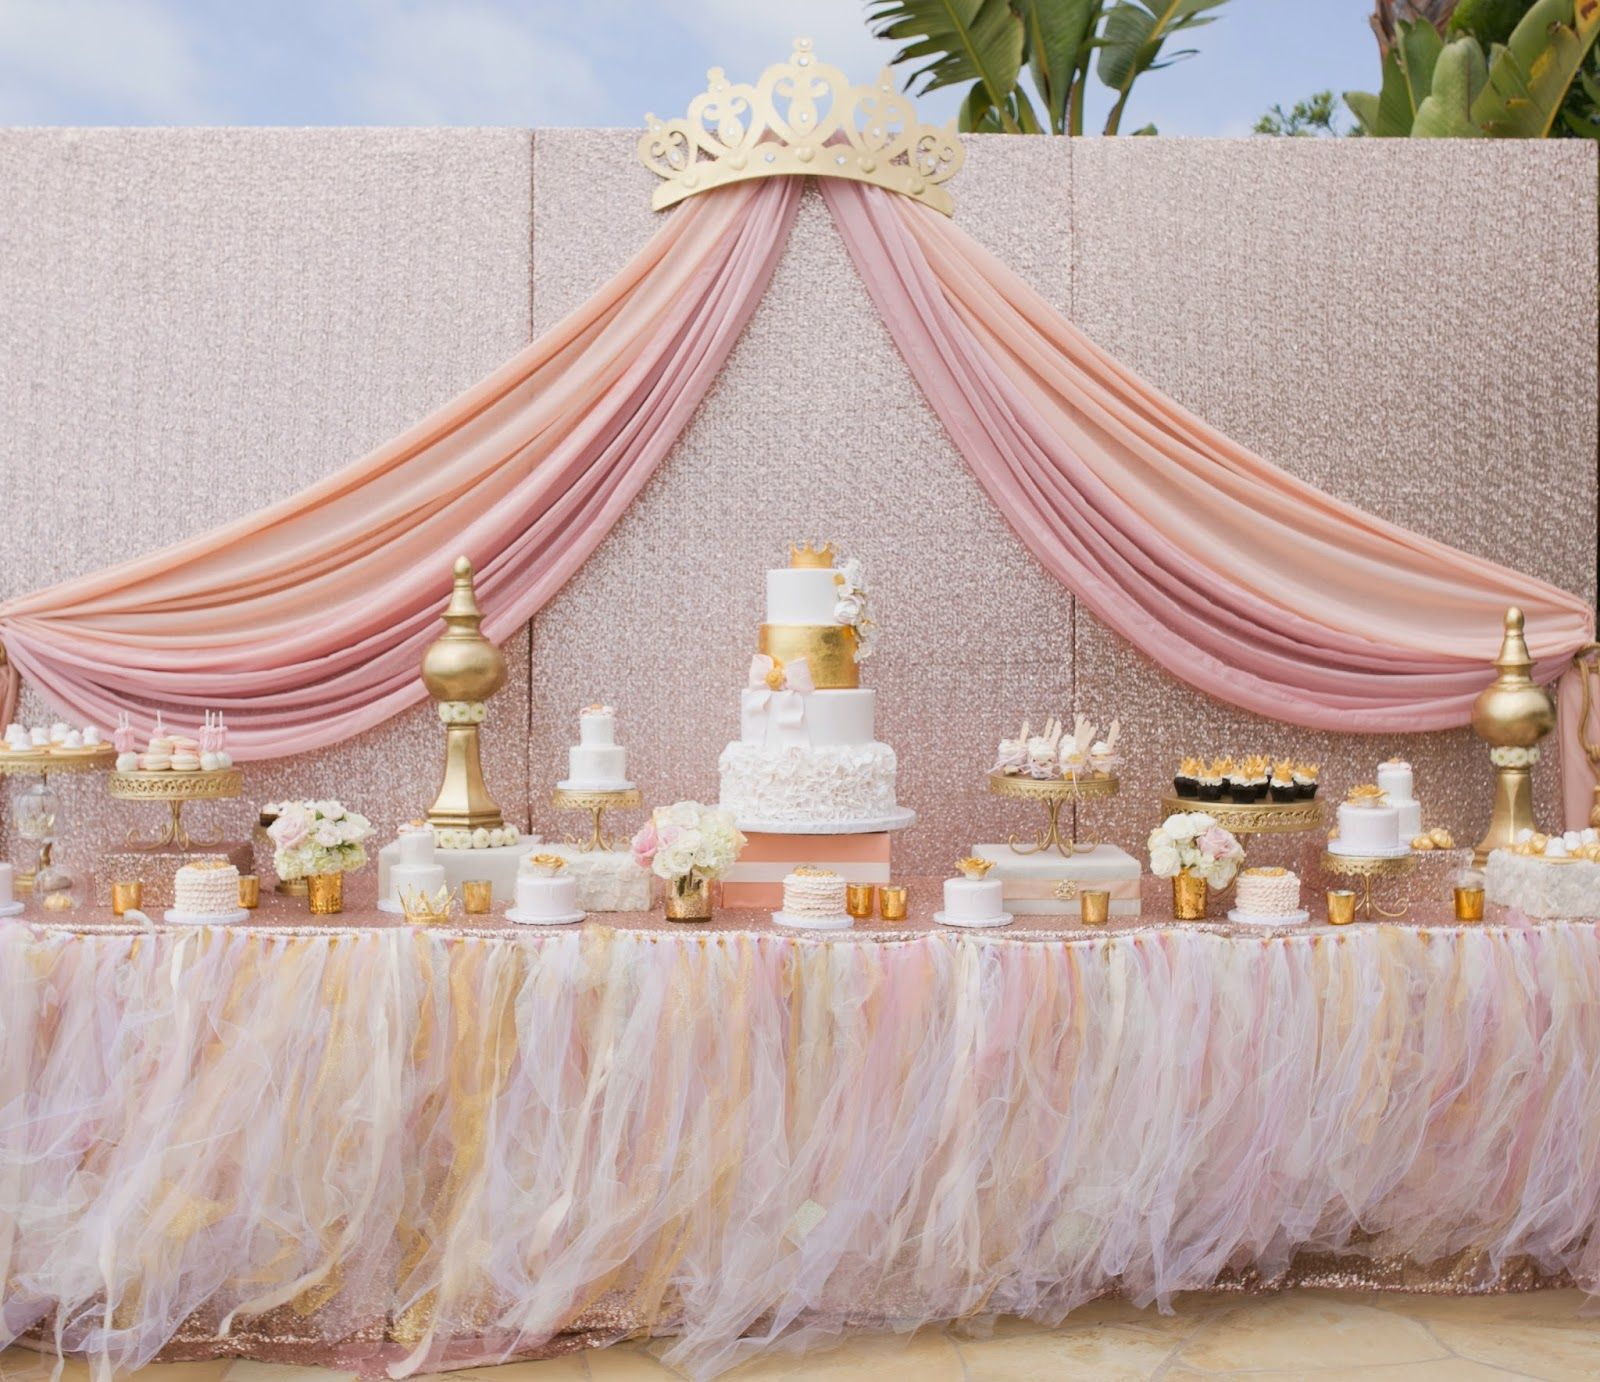 Shawna Yamamoto Event Design Ballerina Princess Baby Shower